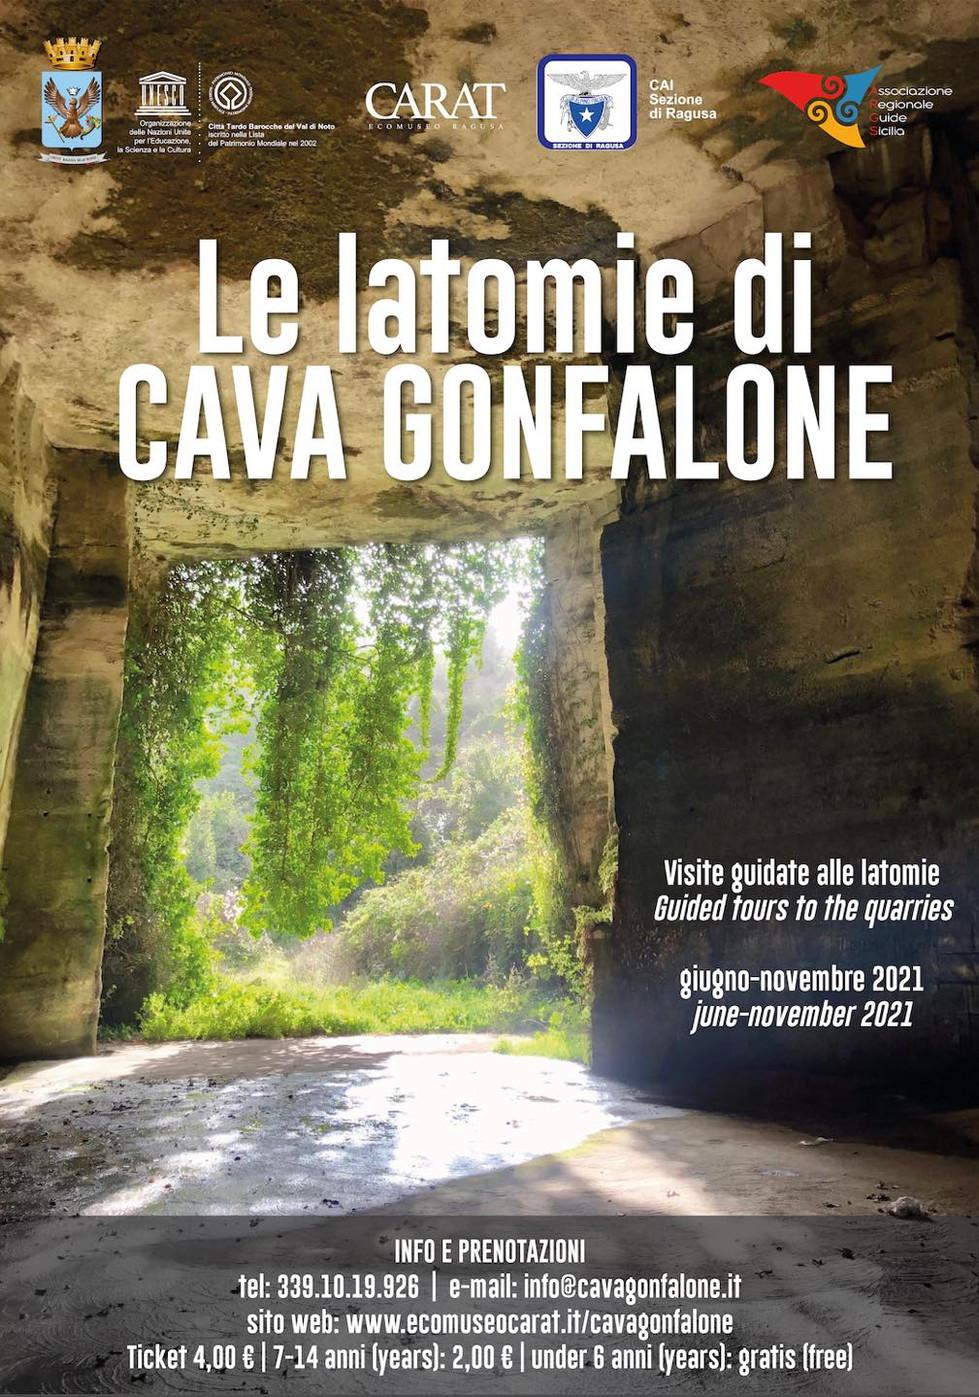 Cava Gonfalone